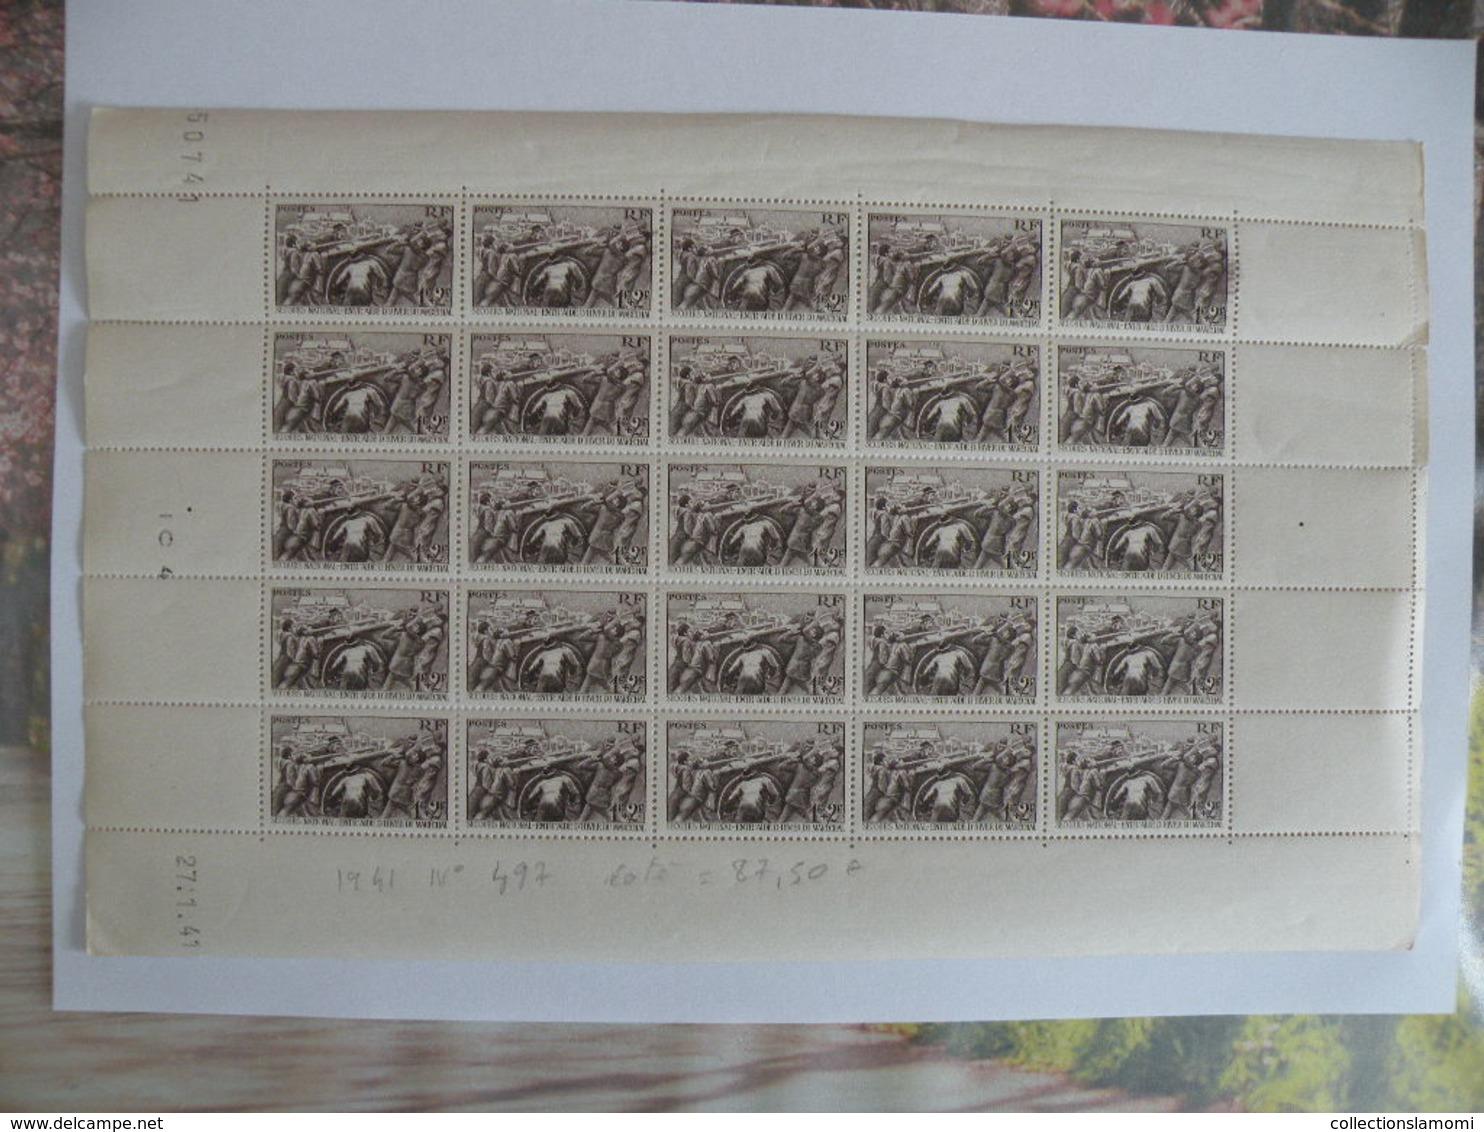 Feuille Coin Daté 27.1.1941 N°497-Secours National - Coté 425€ Feuille Neuf - France